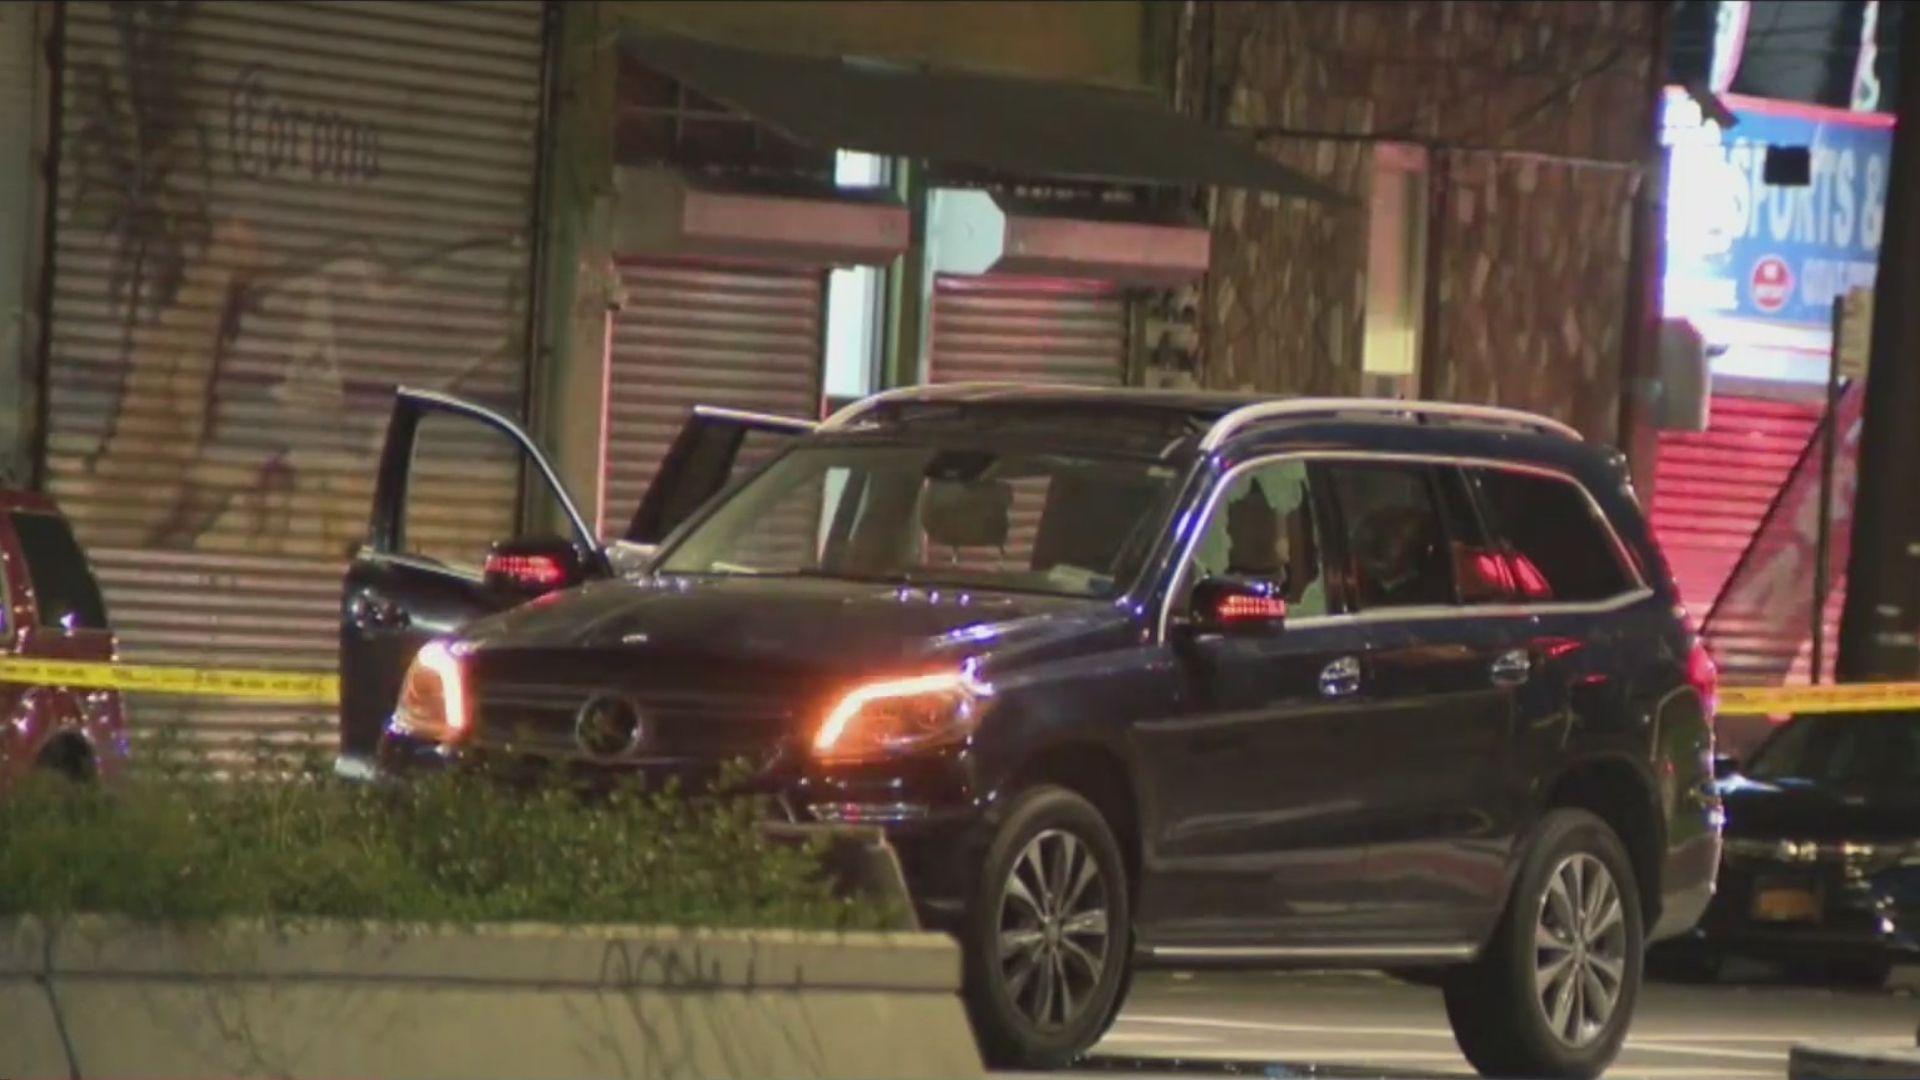 Teens shot in SUV in Cypress Hills, Brooklyn